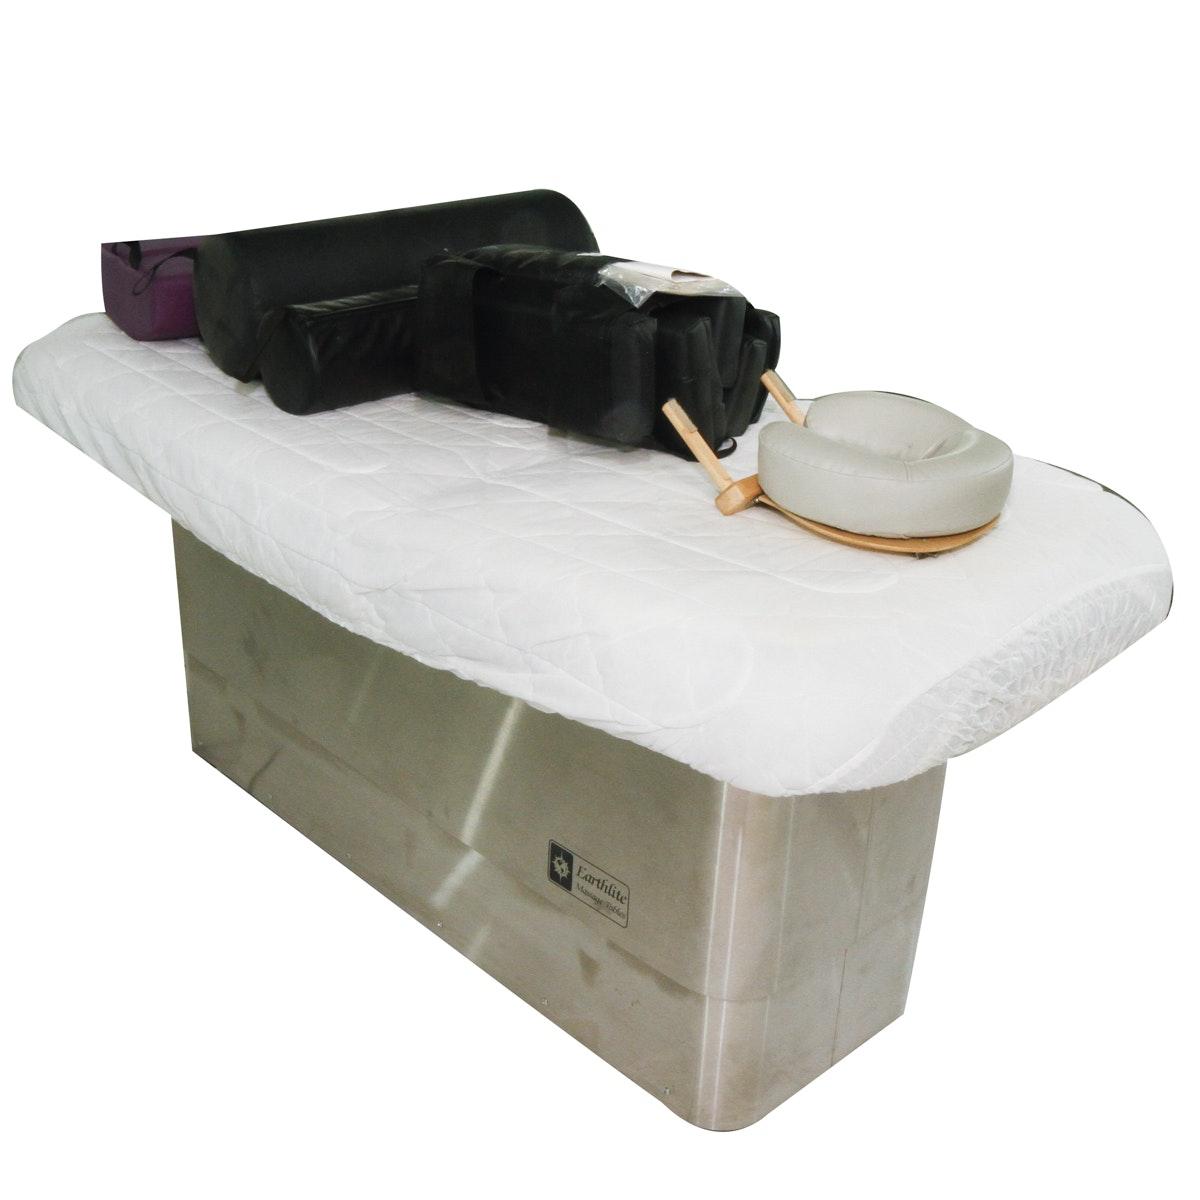 Earthlite Hyrdaulic Massage Table